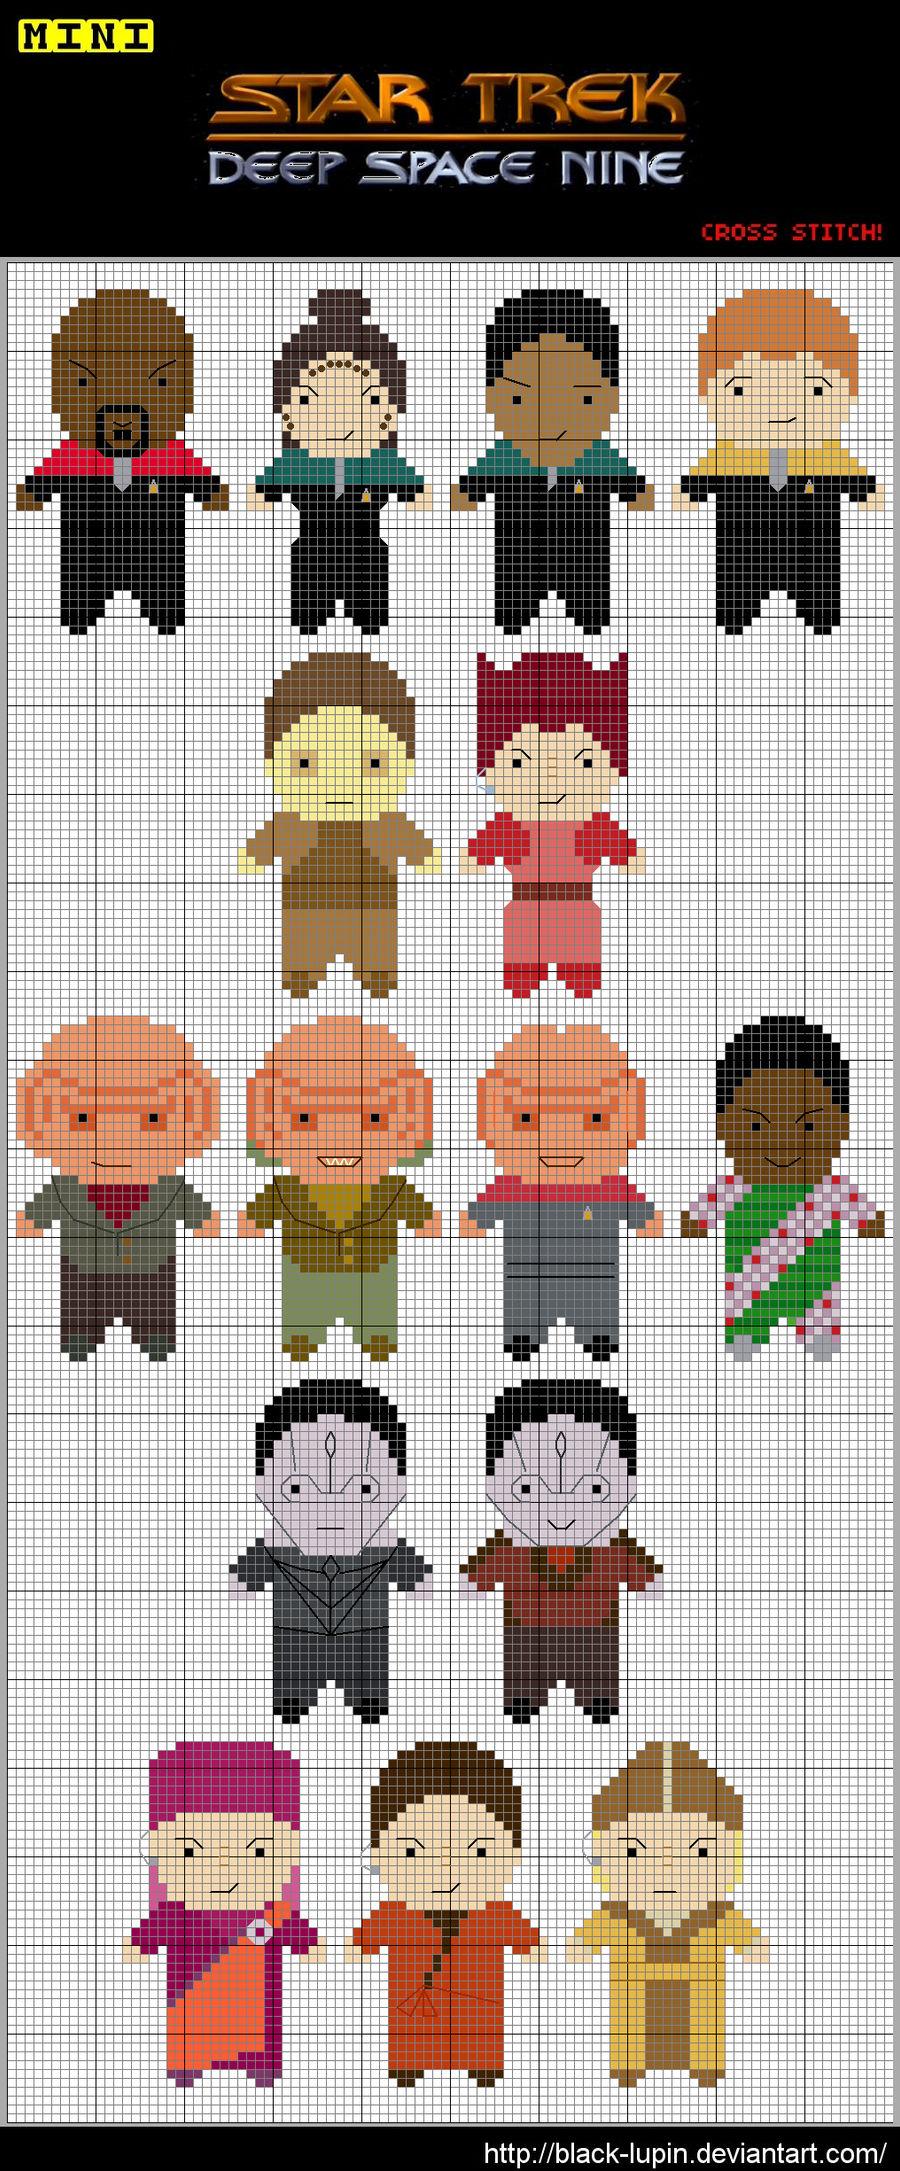 Star Trek DS9 Cross Stitch